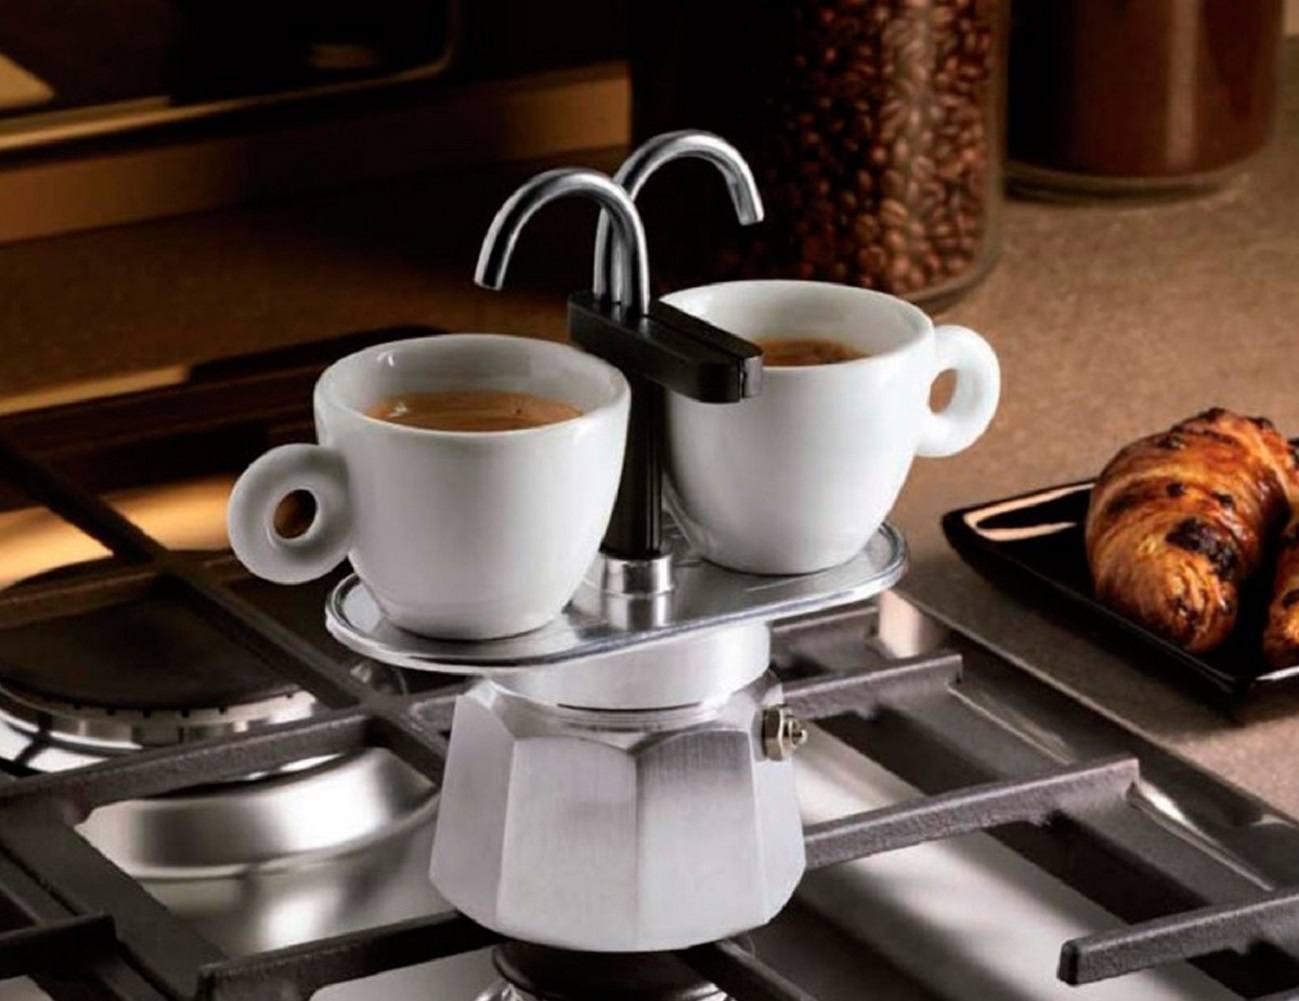 Bialetti Mini Express 2-Cup Stovetop Percolator